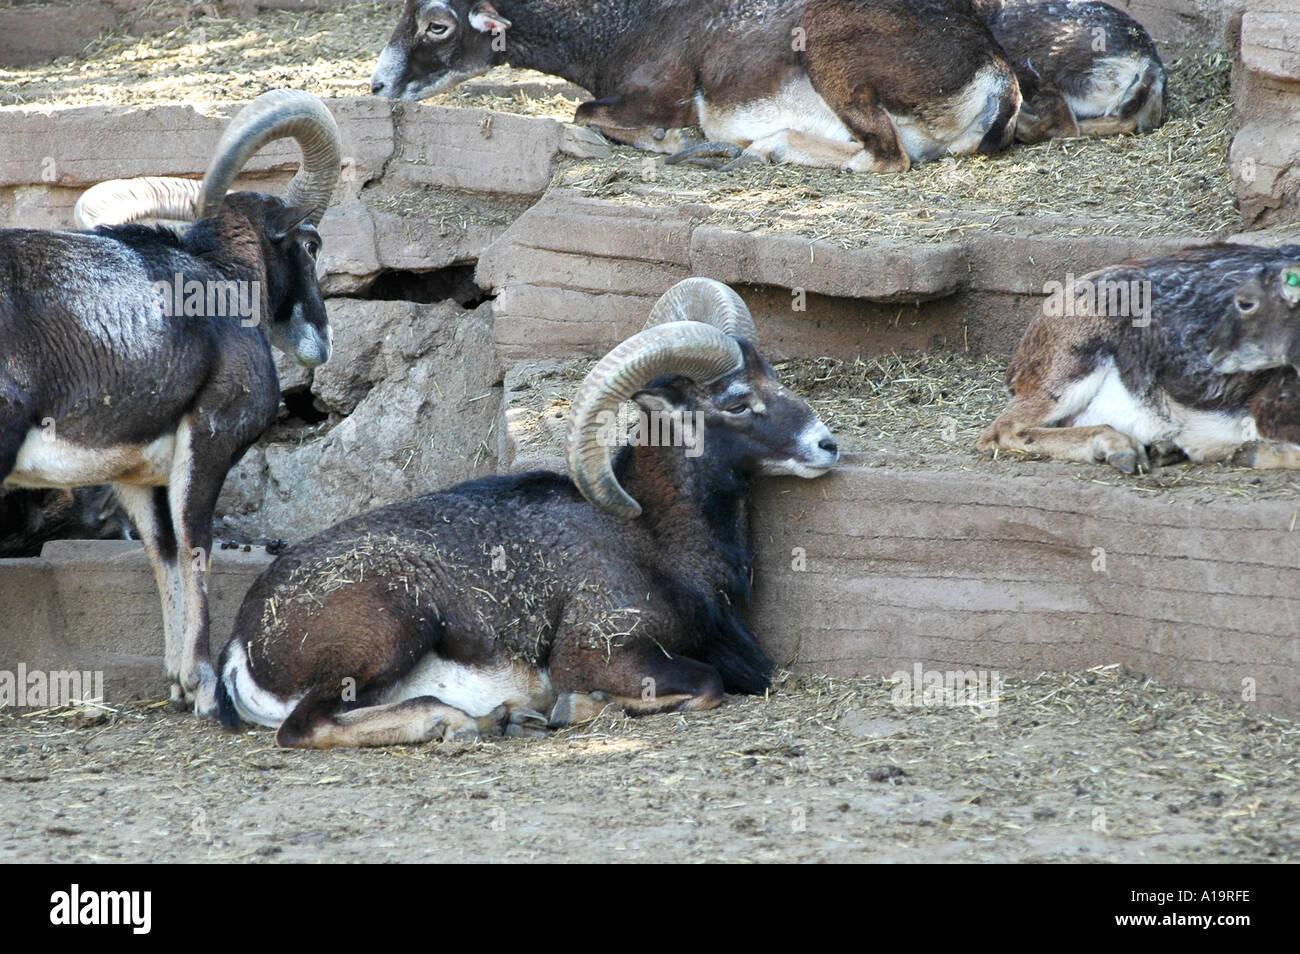 Mouflon wild sheep - Stock Image